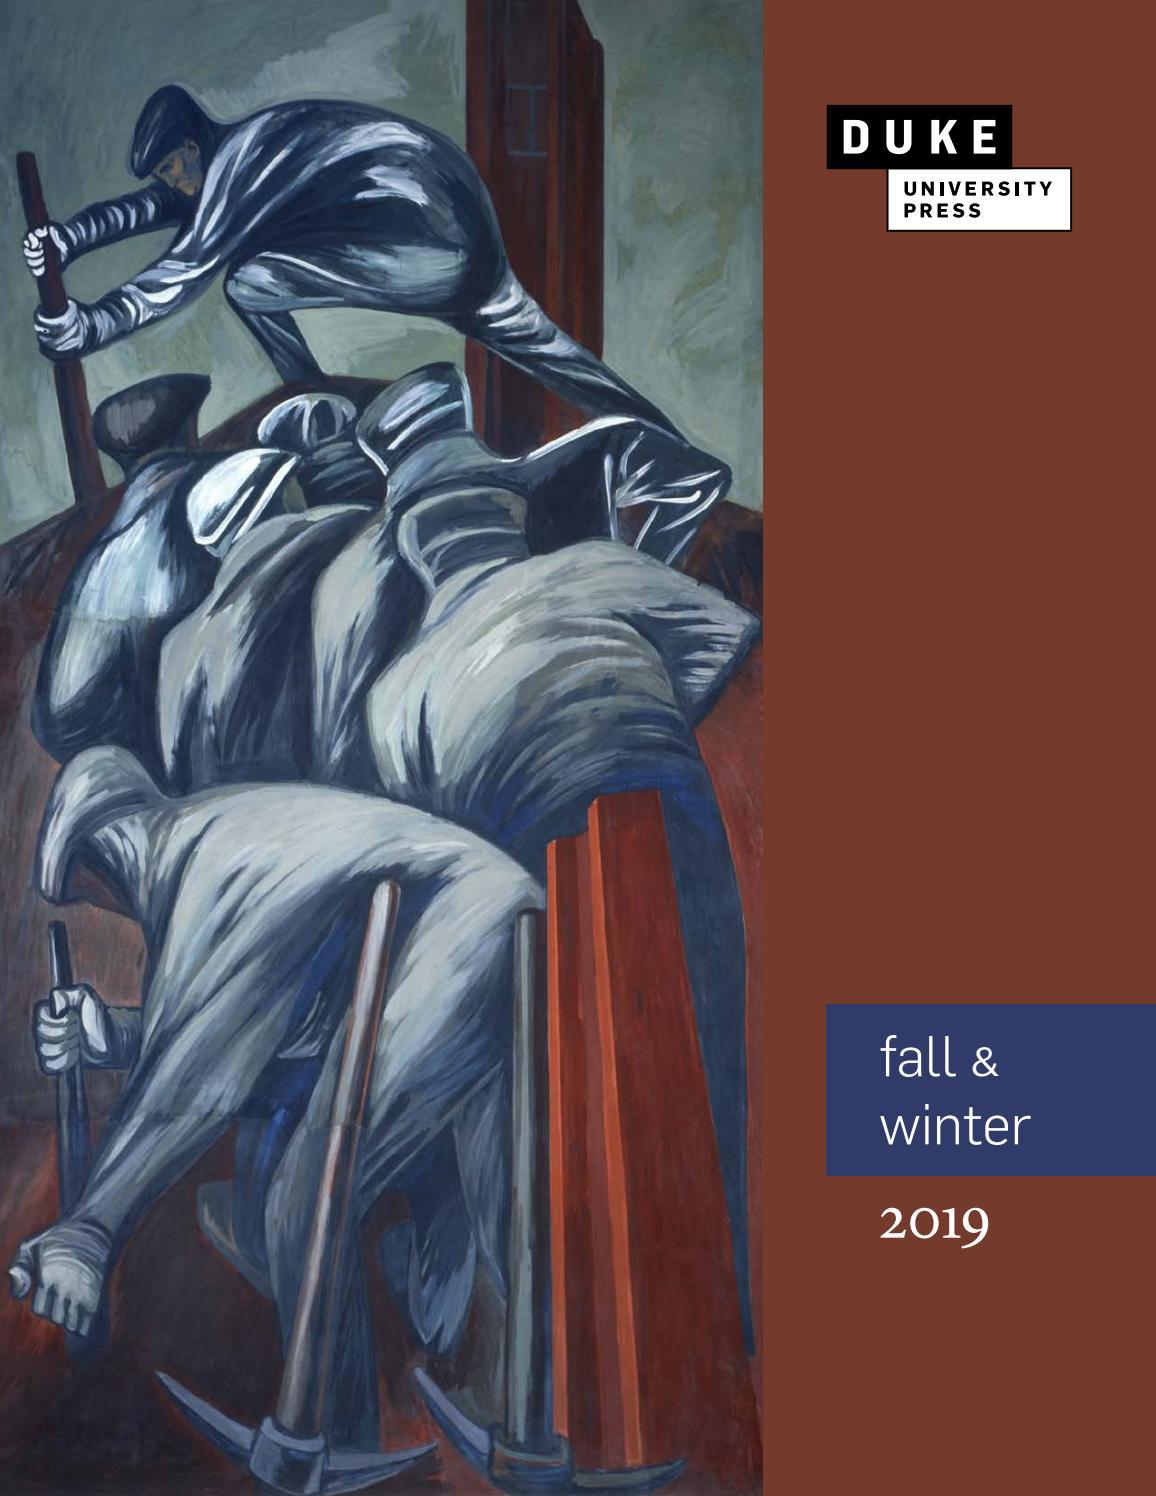 Duke University Press Fall and Winter 2019 Catalog by Duke